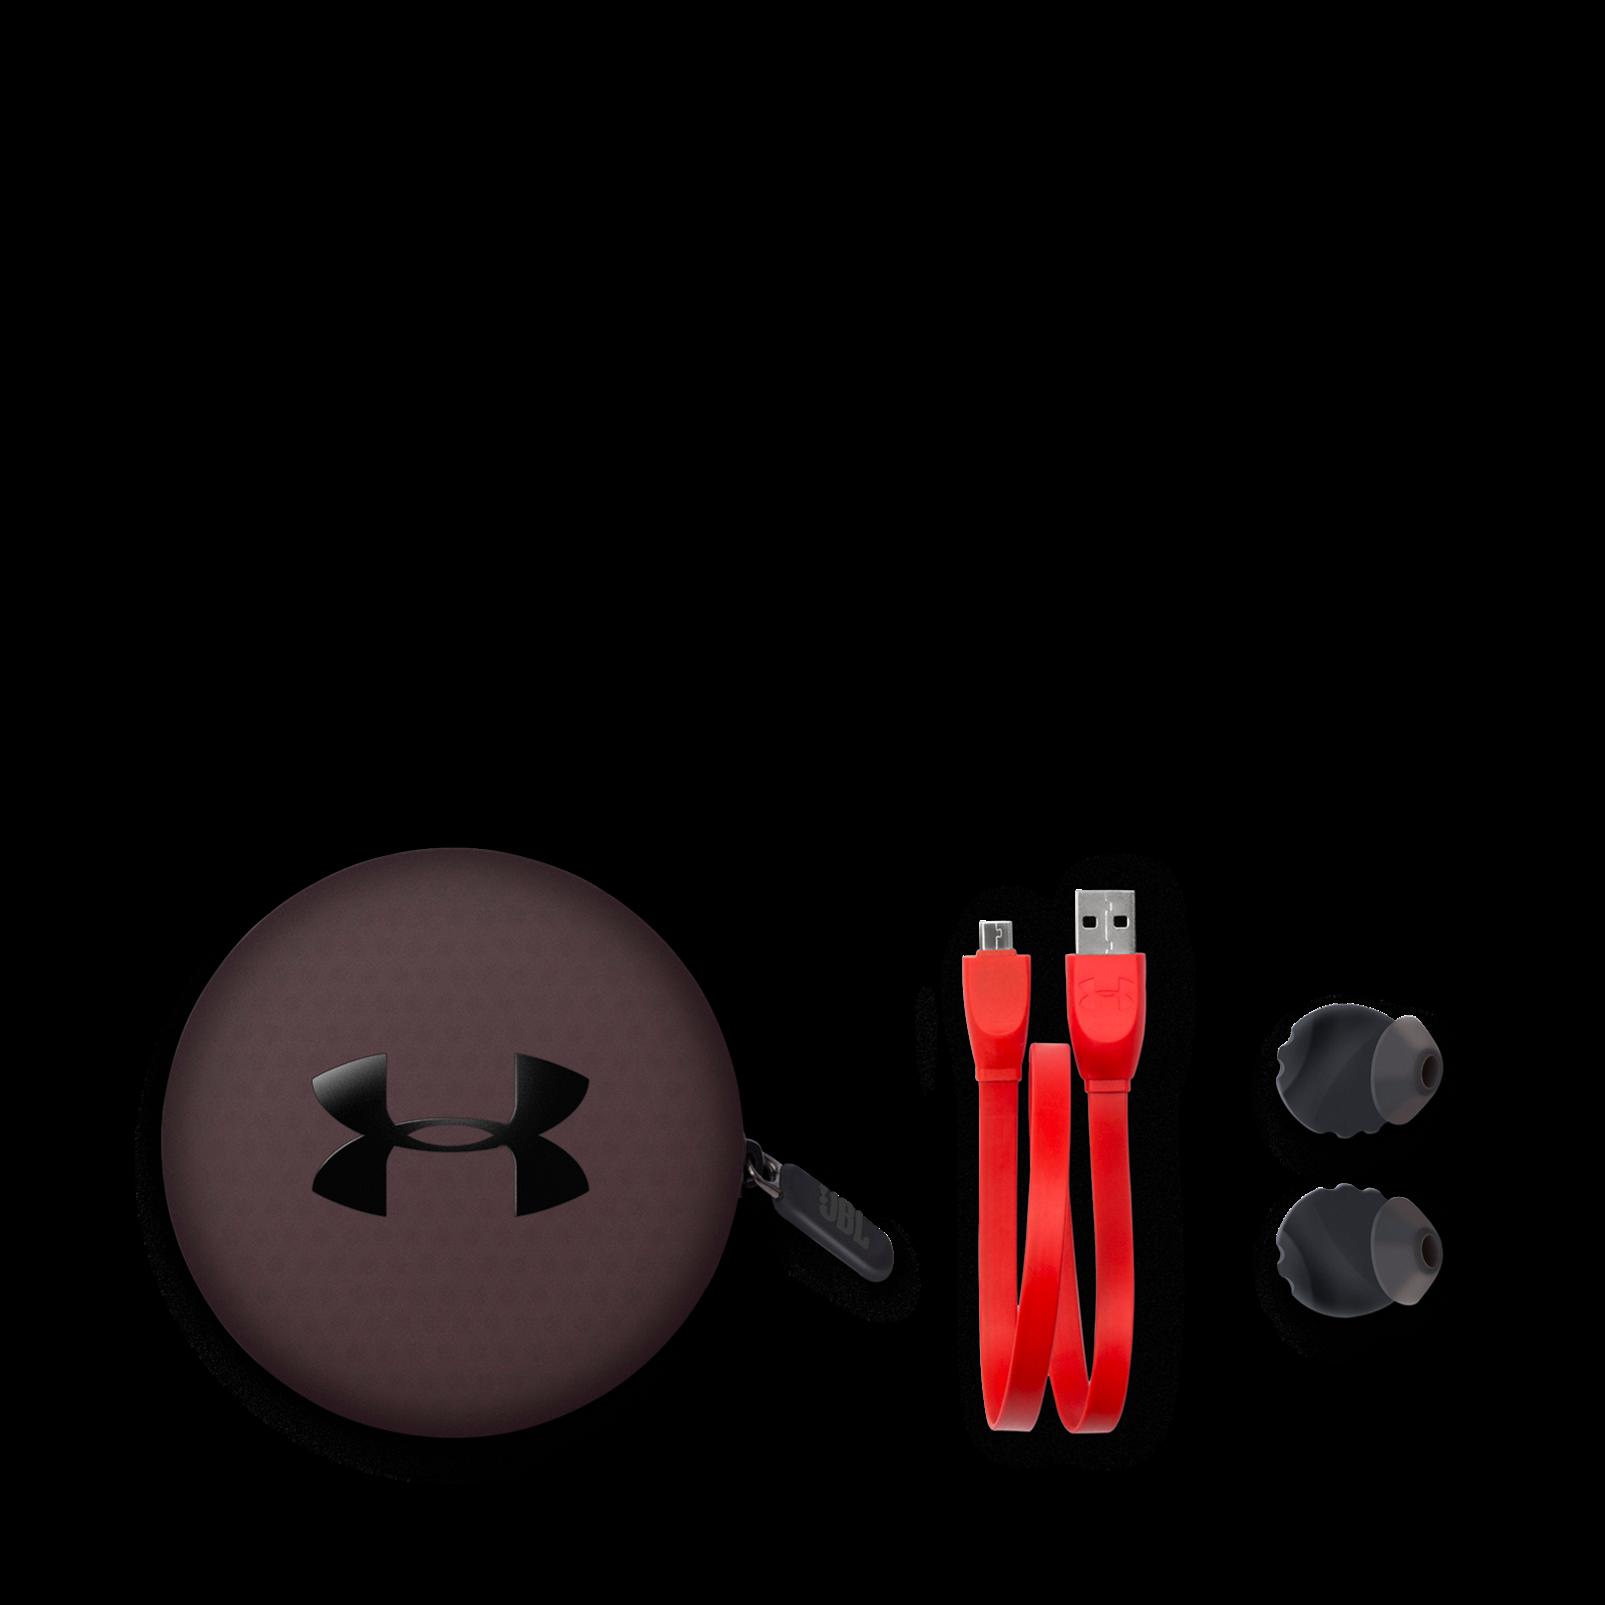 Under Armour Headphones Wireless - Black - UA Headphones Wireless - Engineered by JBL - Detailshot 5